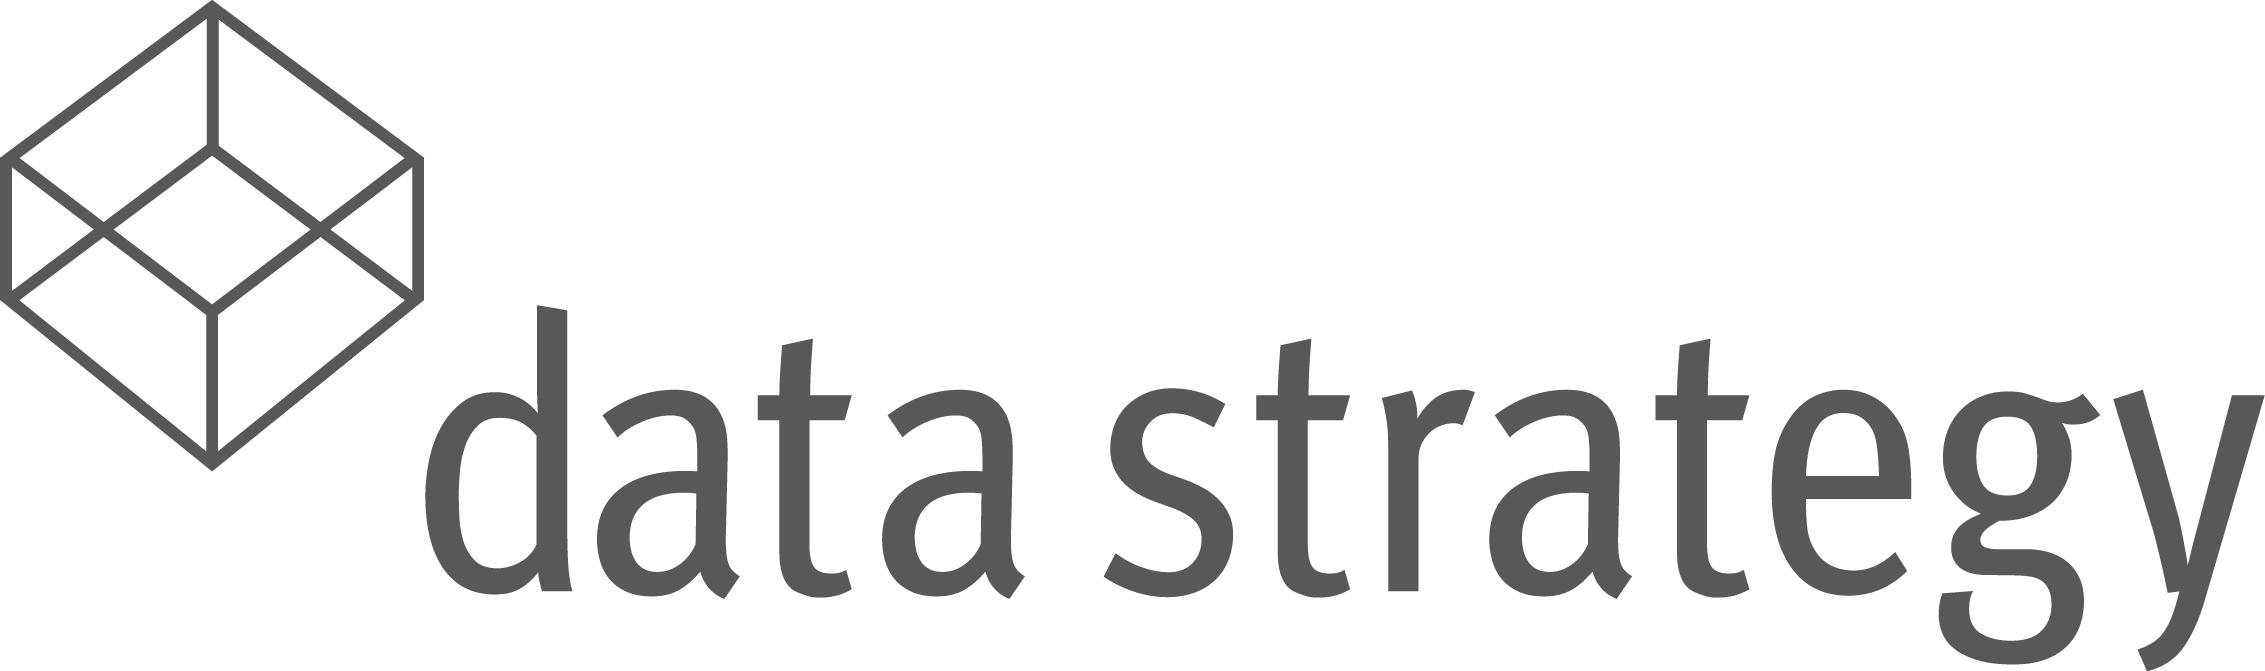 data_strategy